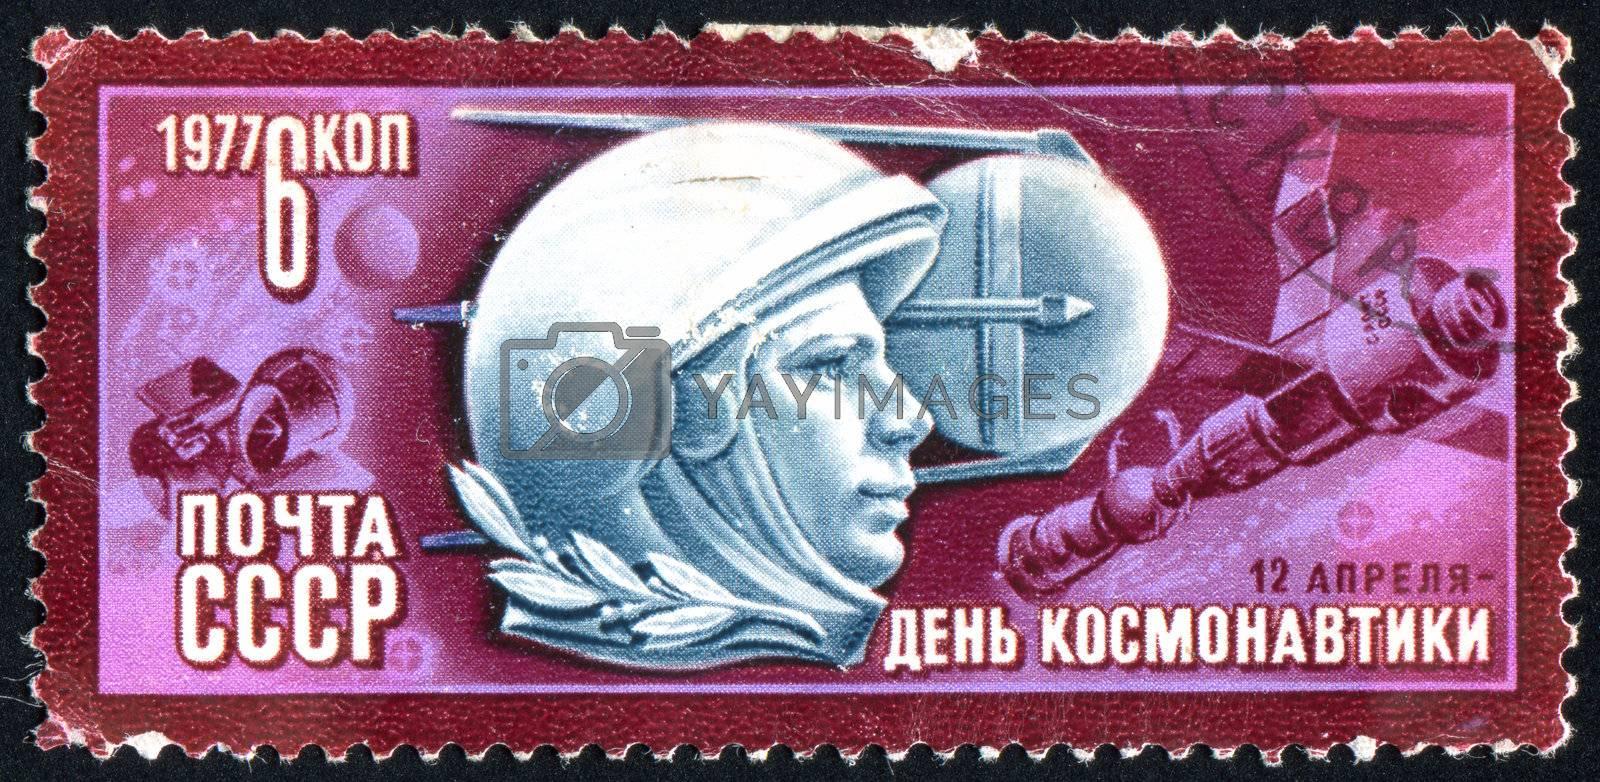 RUSSIA - CIRCA 1977: stamp printed by Russia, shows Yuri A. Gagarin, circa 1977.